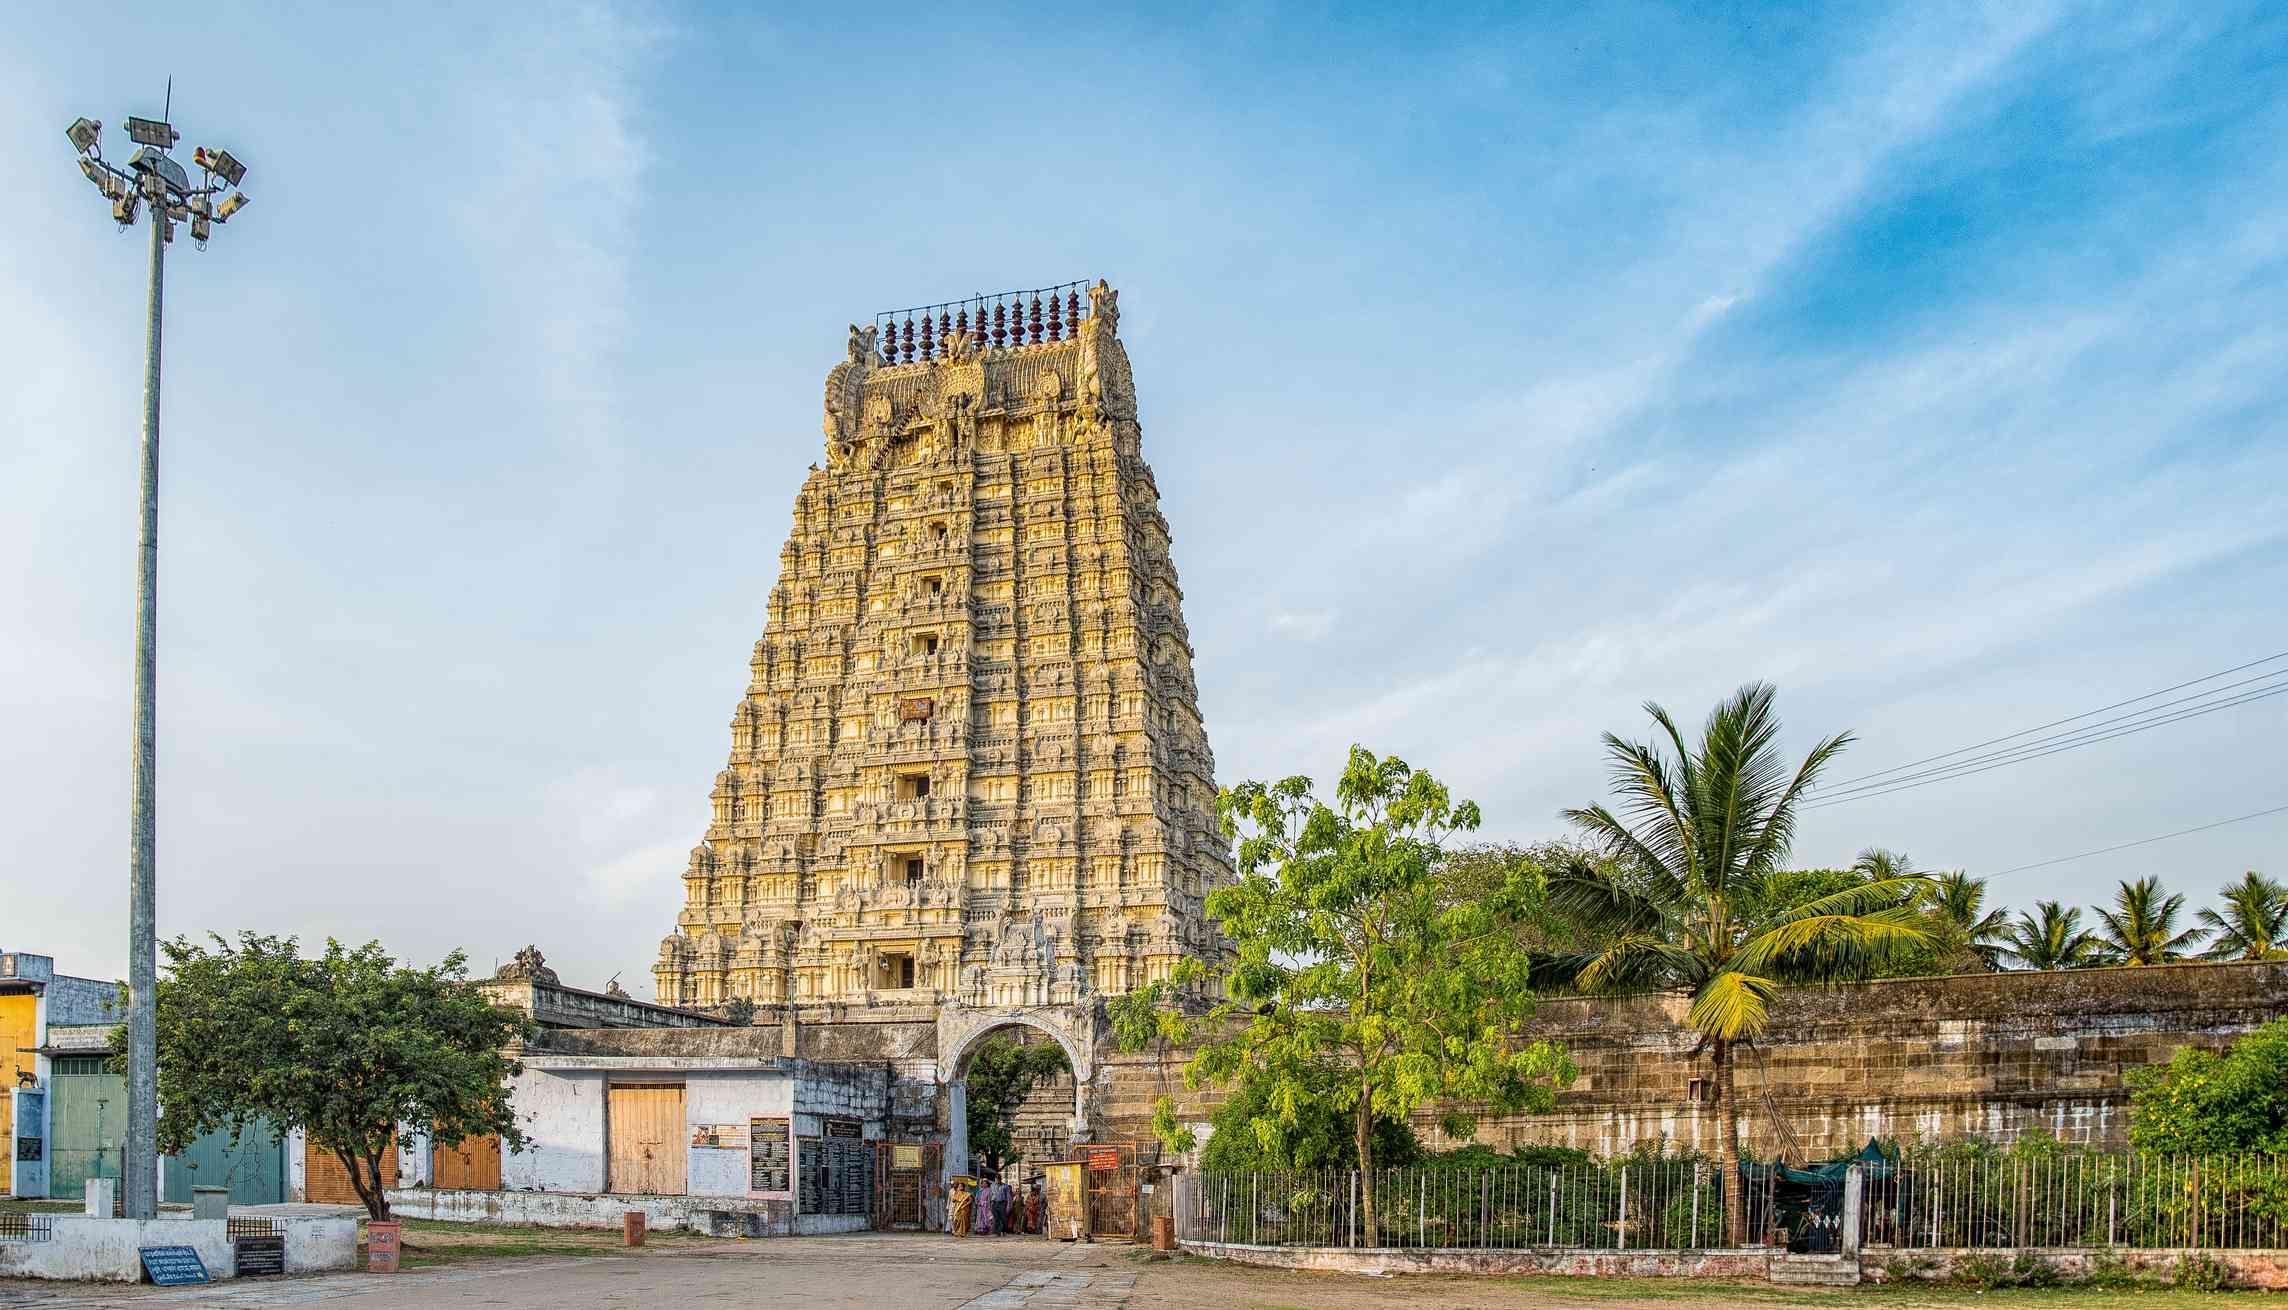 Pale yellow towers of Ekambareswarar Temple, dedicated to Lord Shiva at Kanchipuram, near Chennai